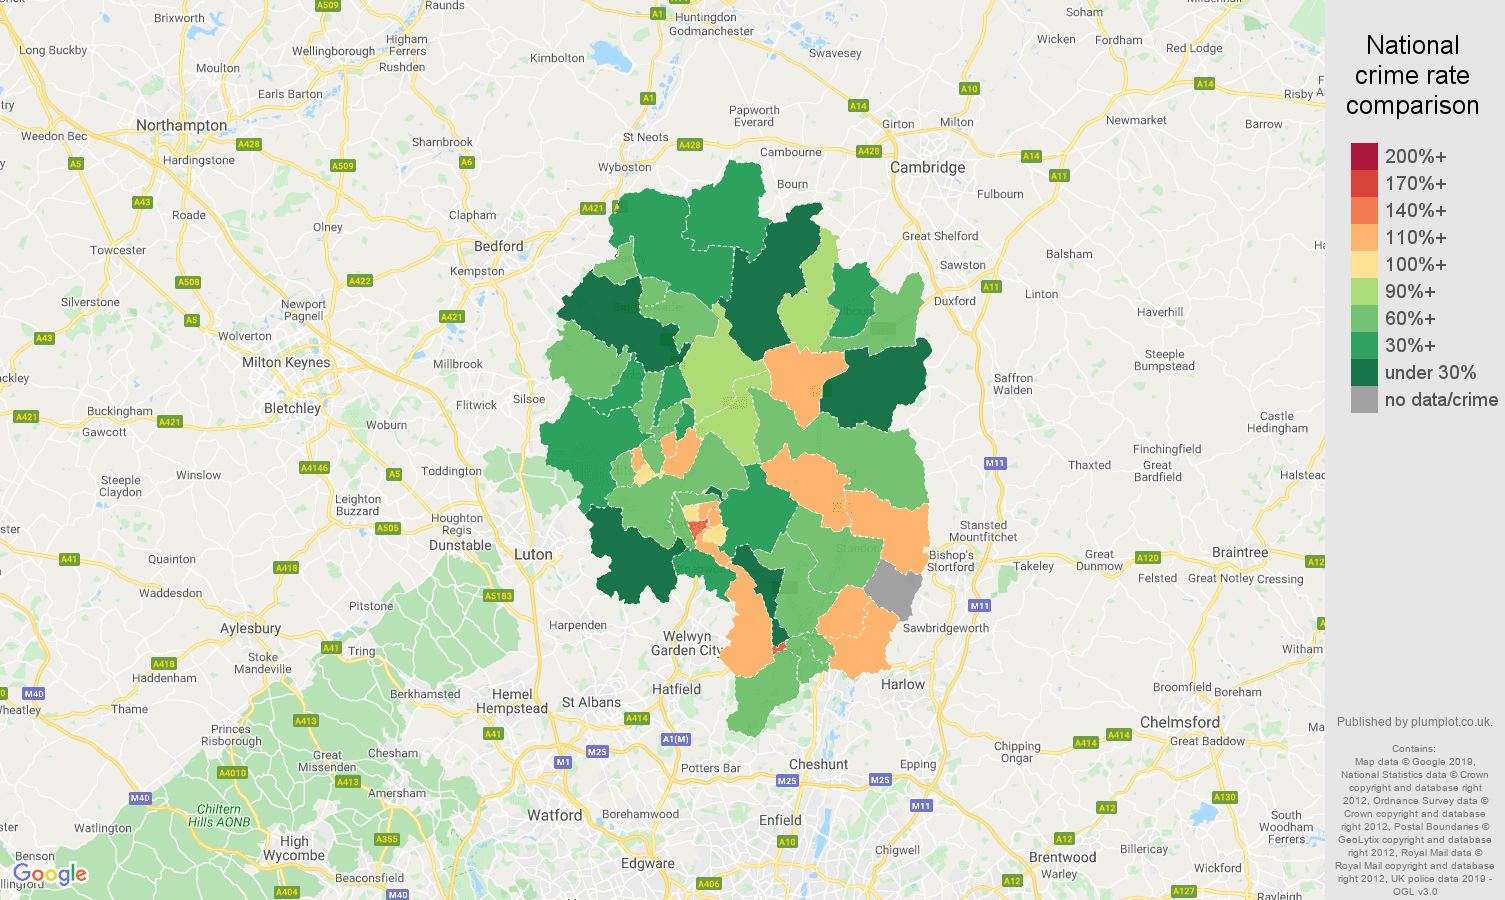 Stevenage other crime rate comparison map